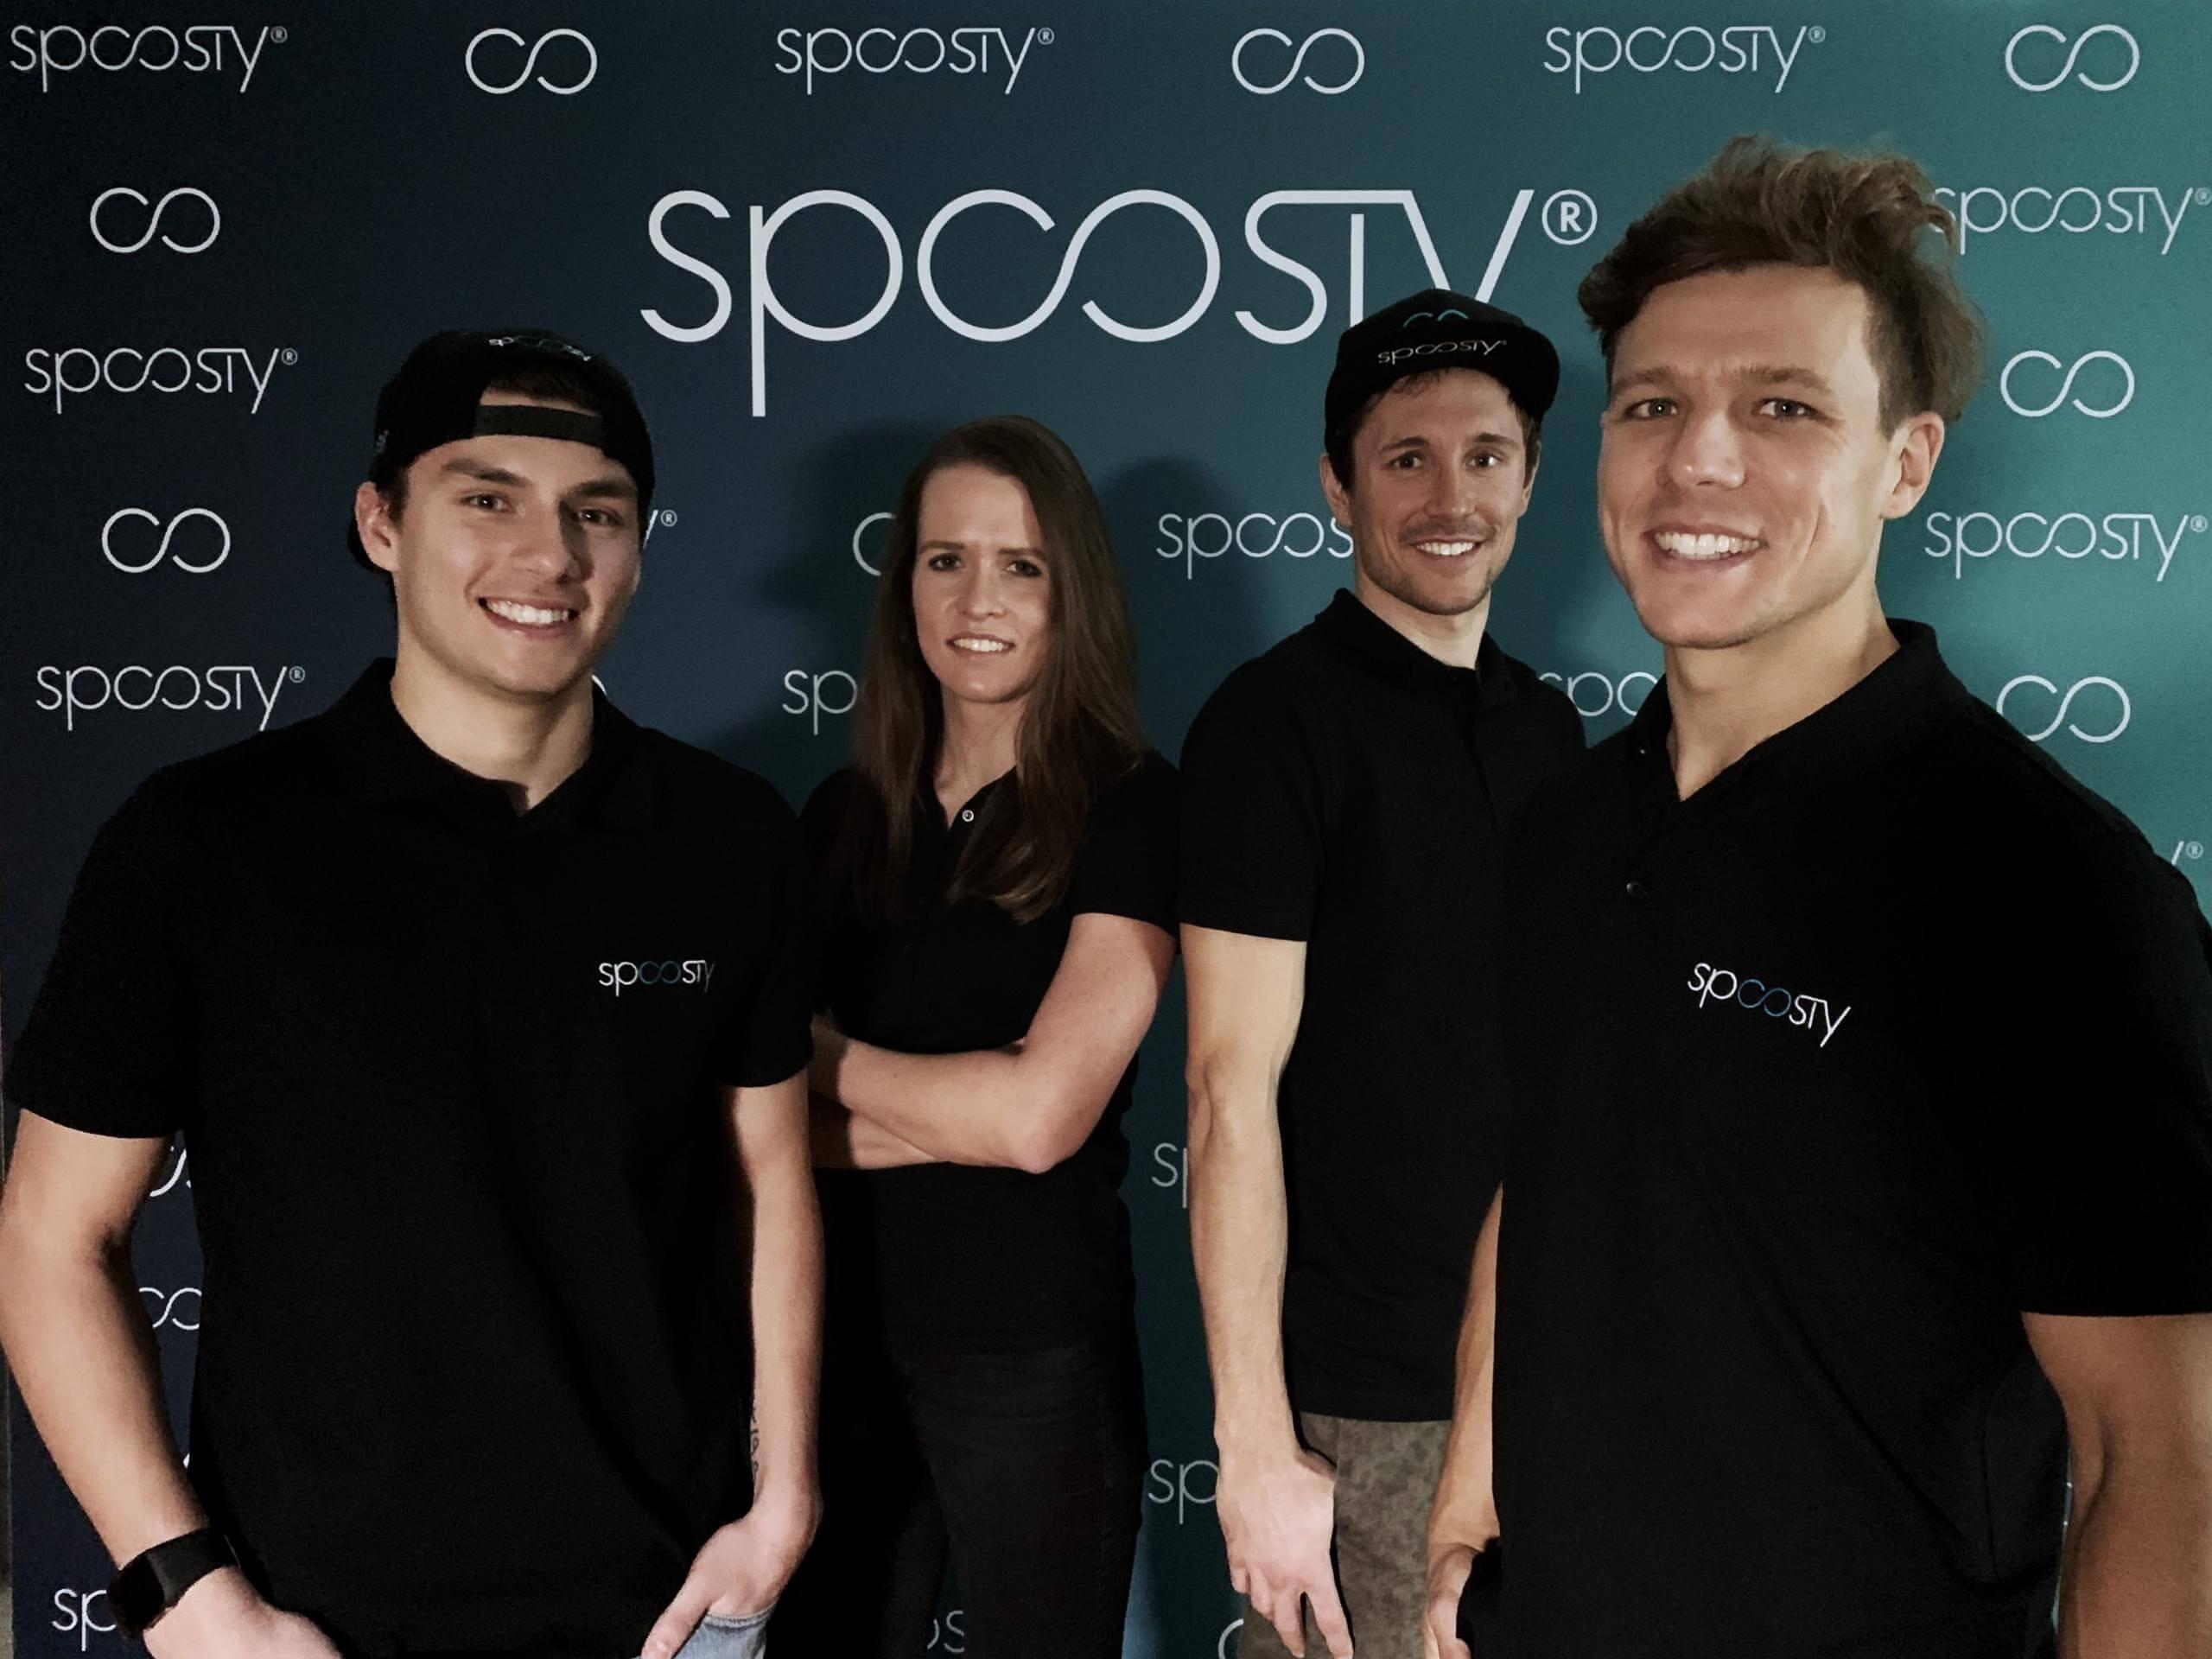 Spoosty Pro Tri Team